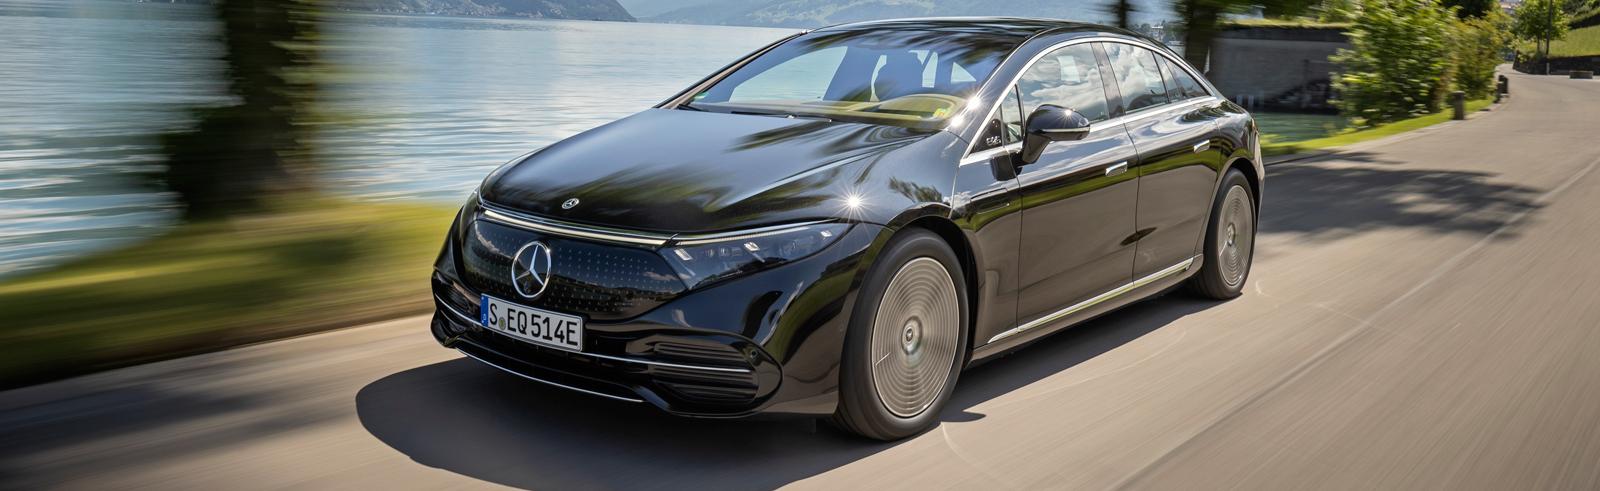 2022 Mercedes-Benz EQS 450+ and EQS 580 4MATIC go on sale